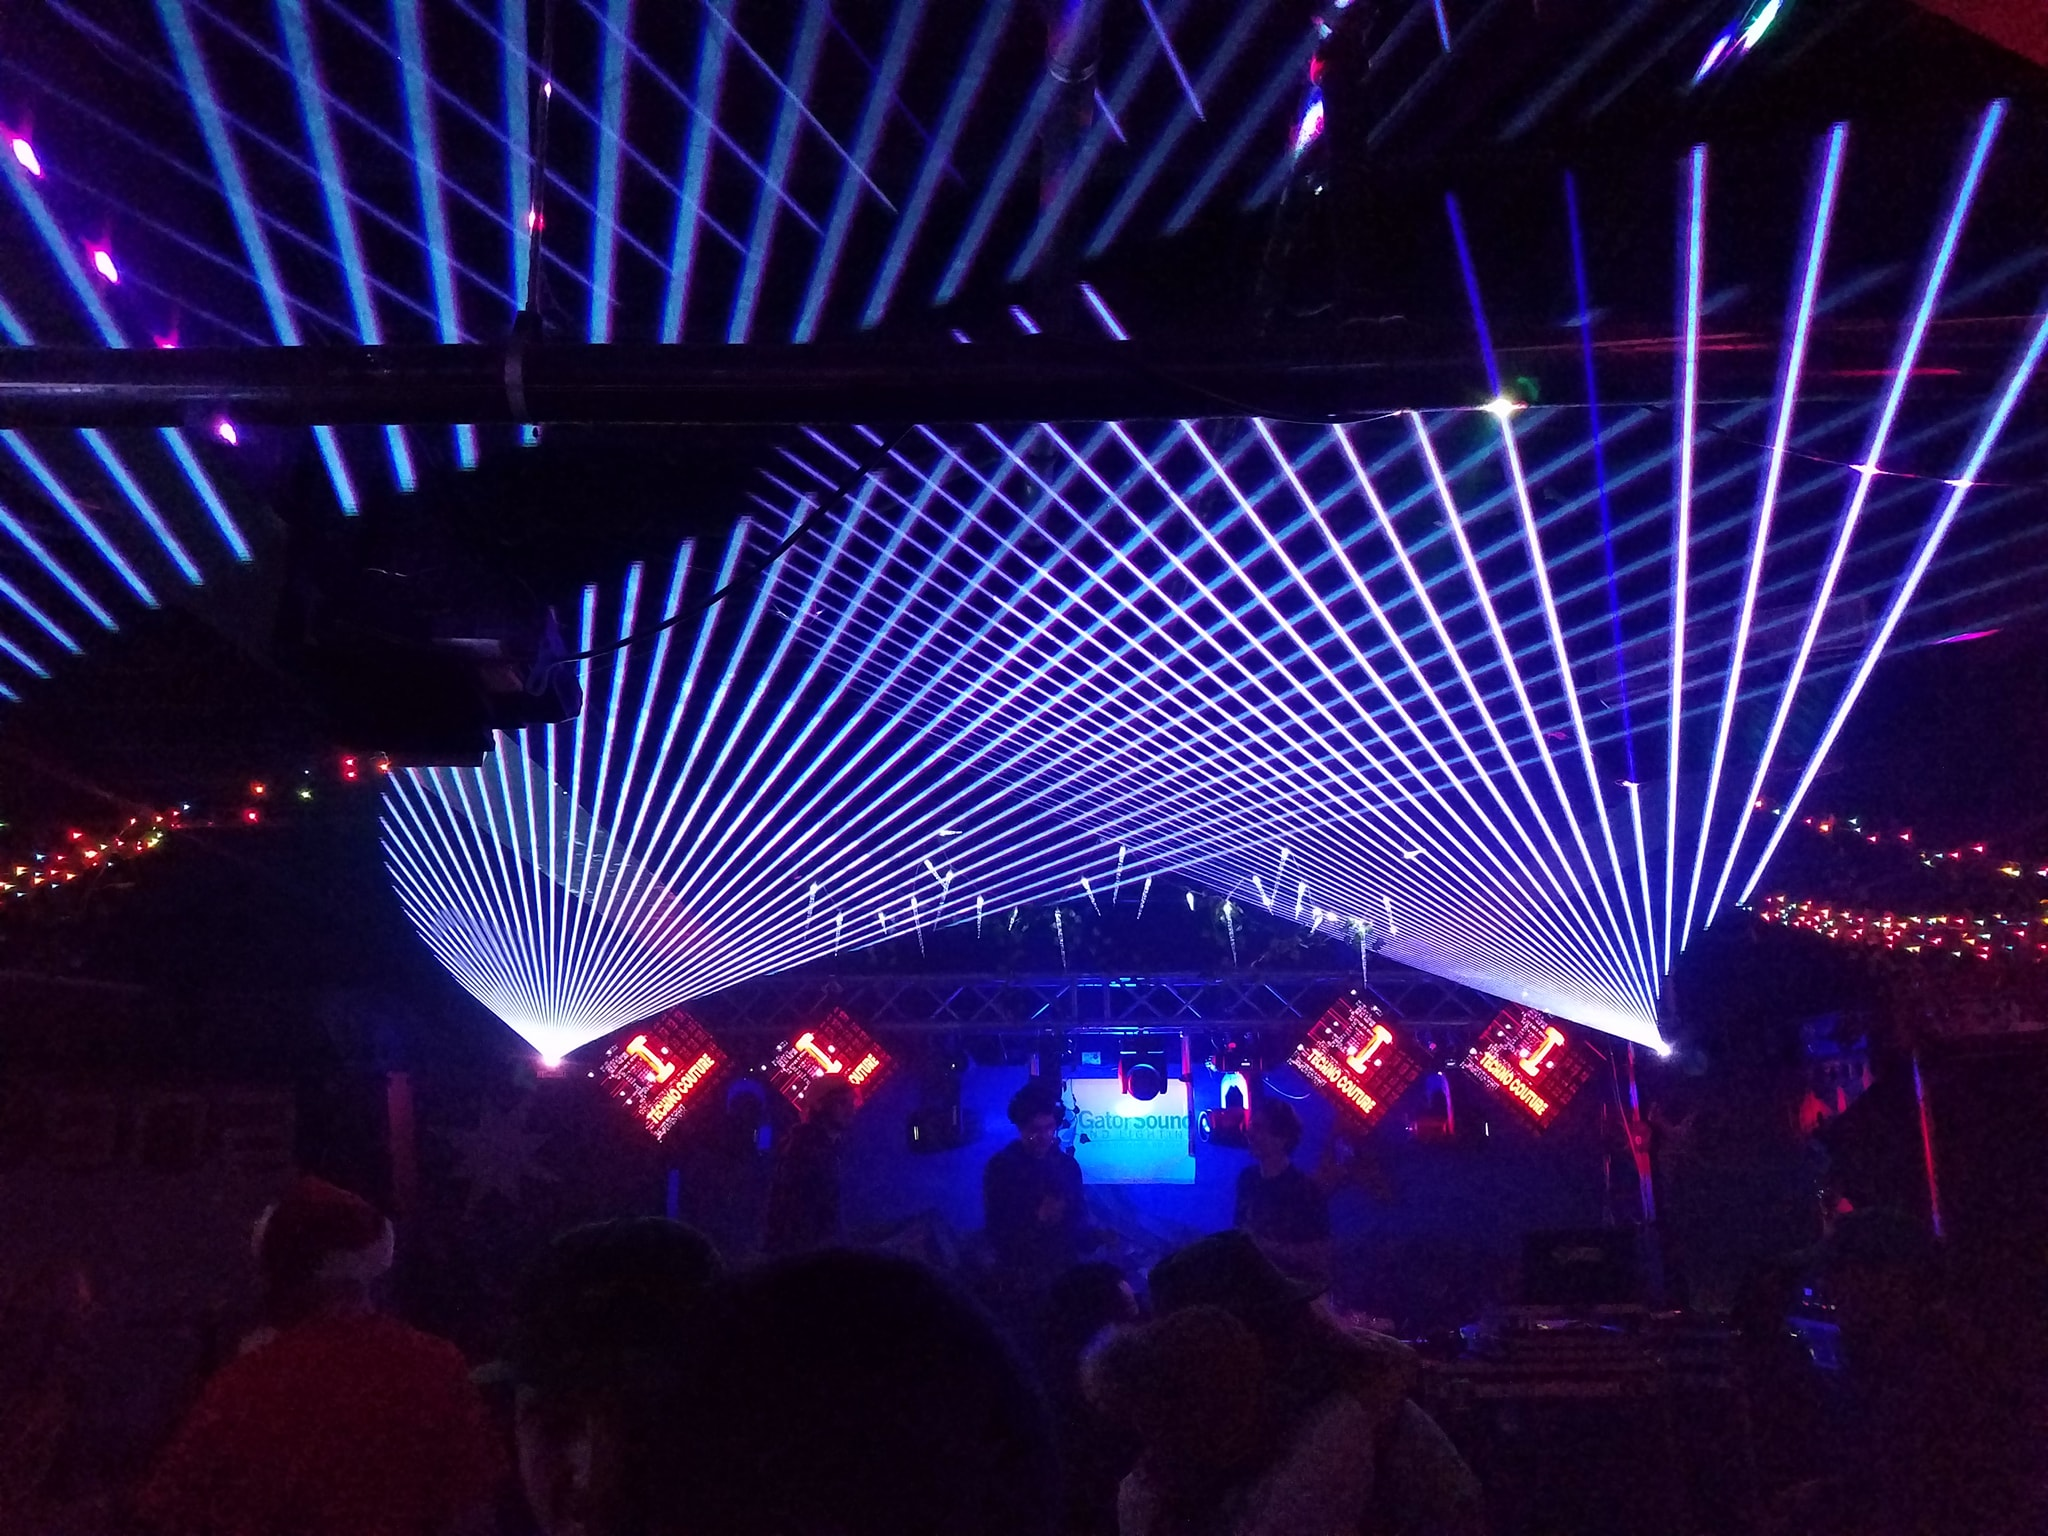 lasersss